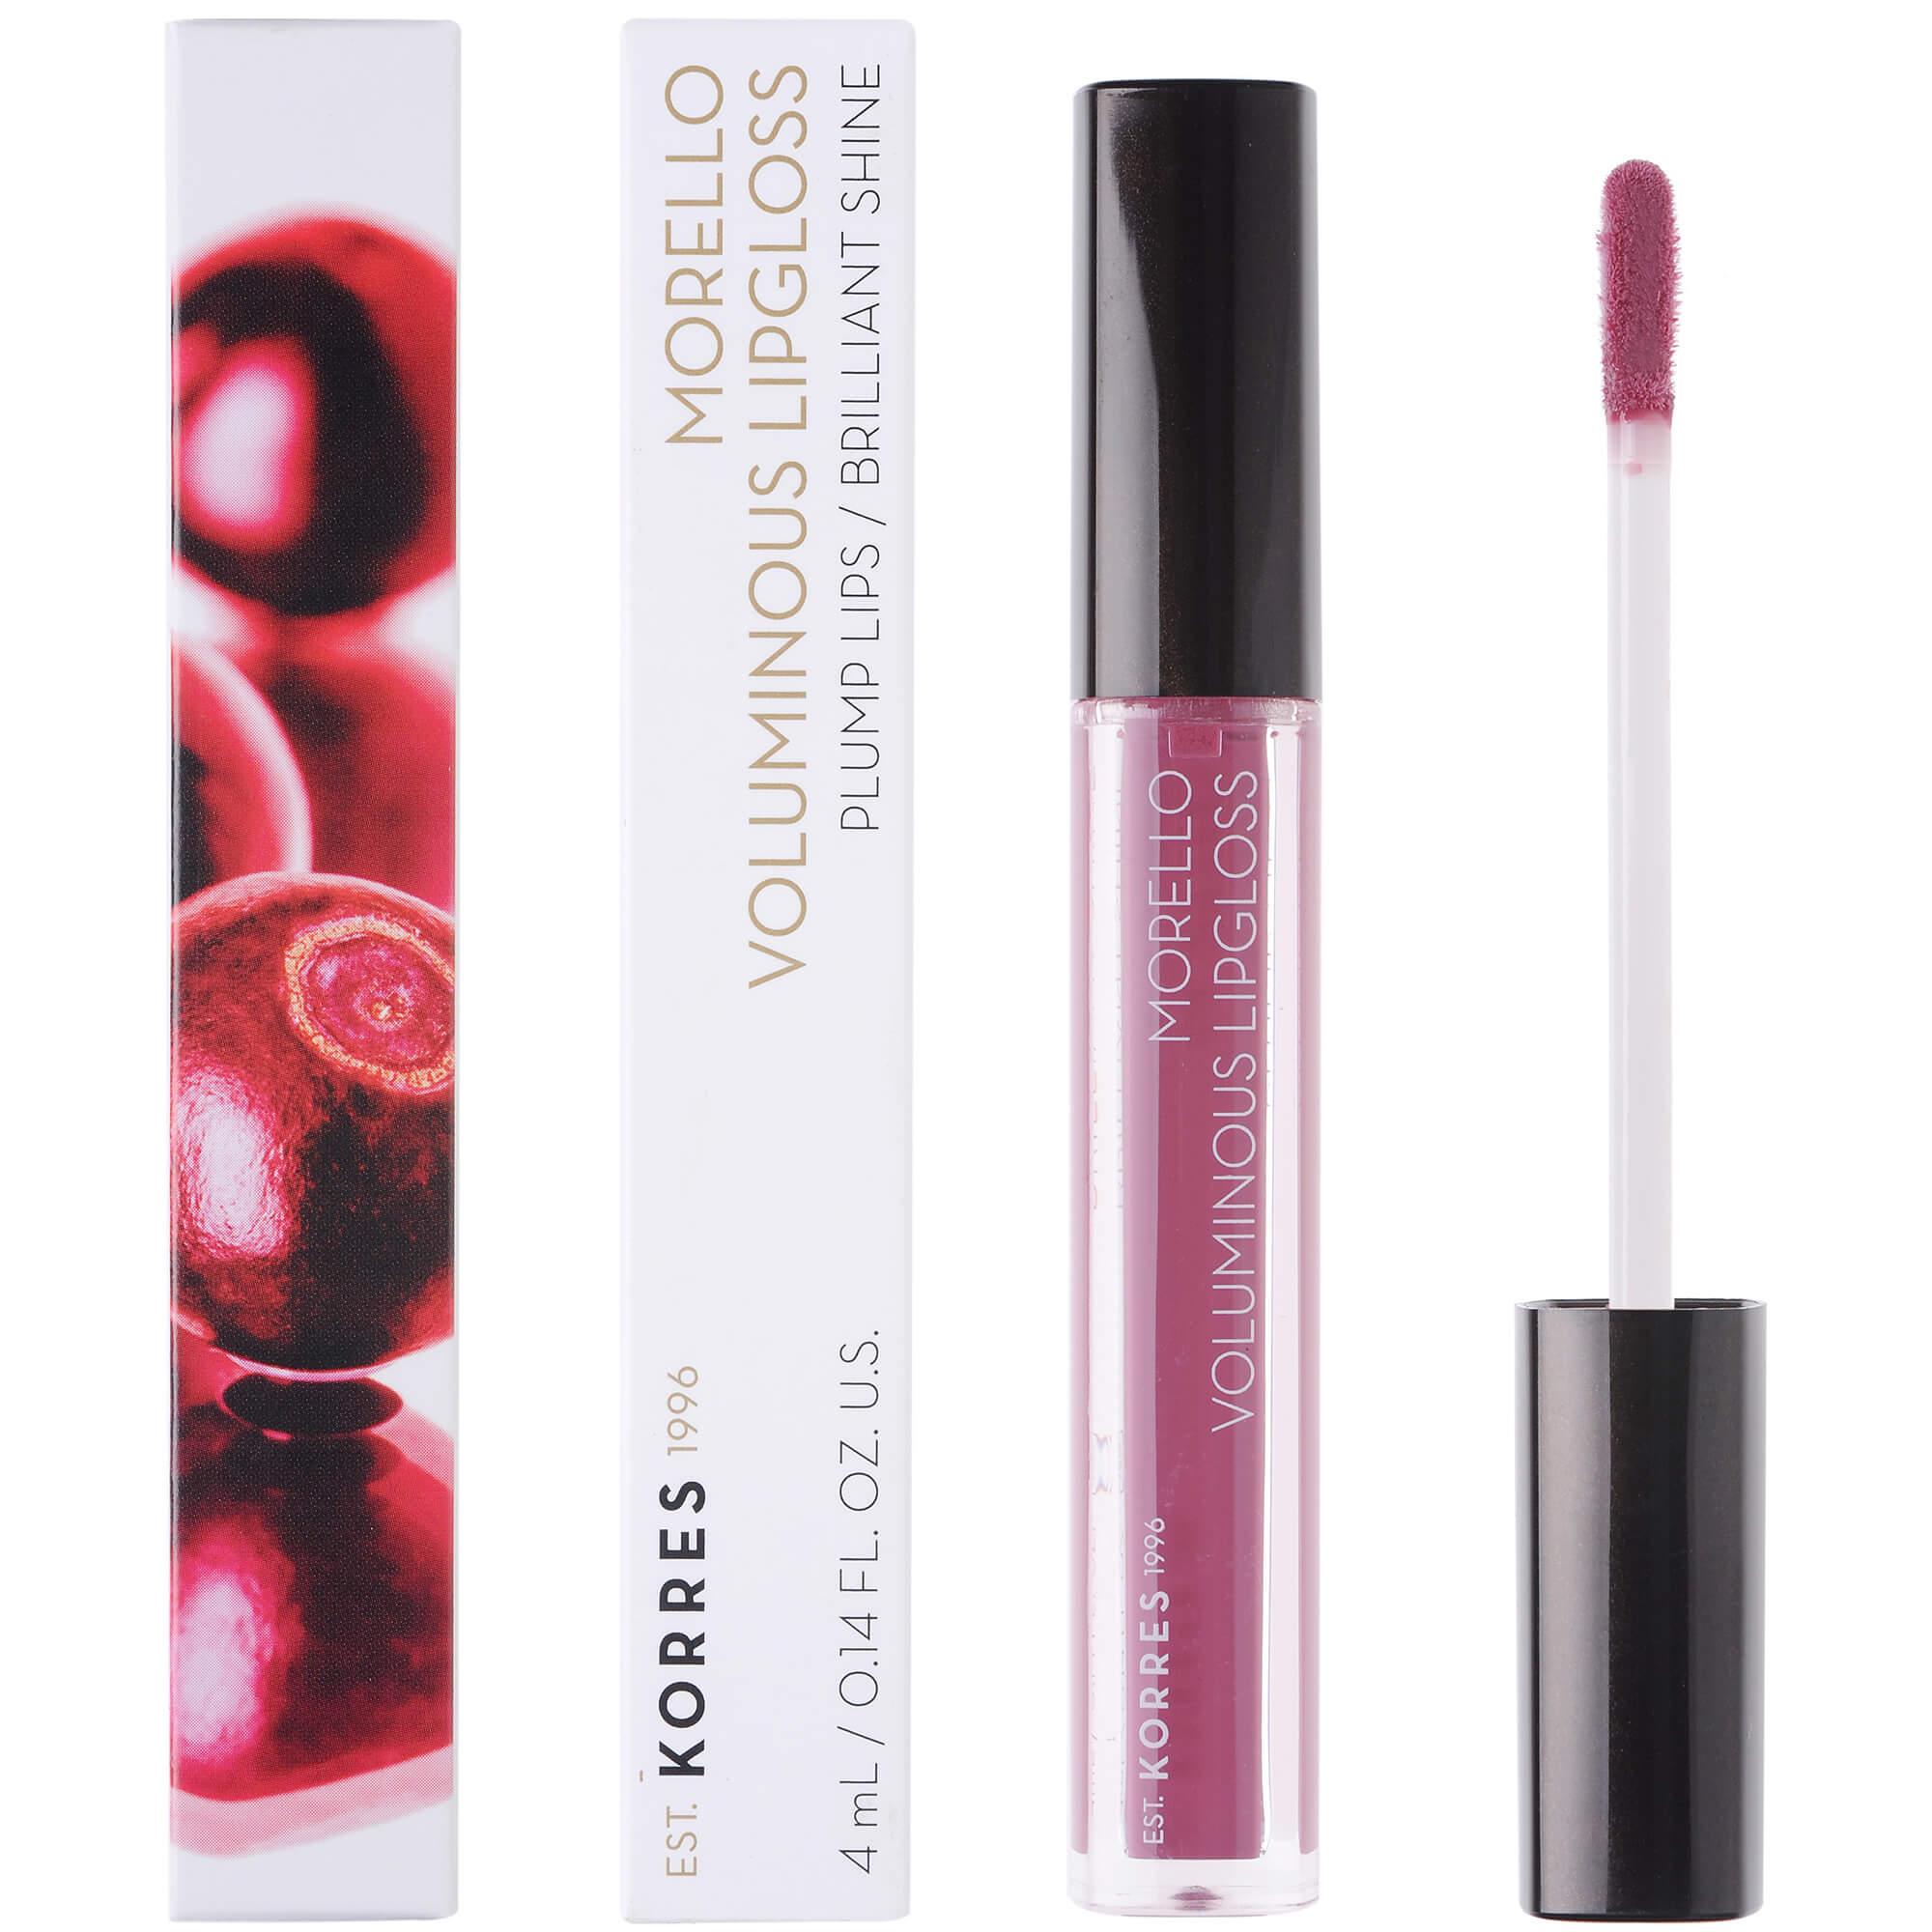 Korres Morello Voluminous Lipgloss Brilliant Shine Ενυδατικό Lipgloss με Εξαιρετική Λάμψη & Γεμάτο Χρώμα που Διαρκεί 4ml – 27 Berry Purple